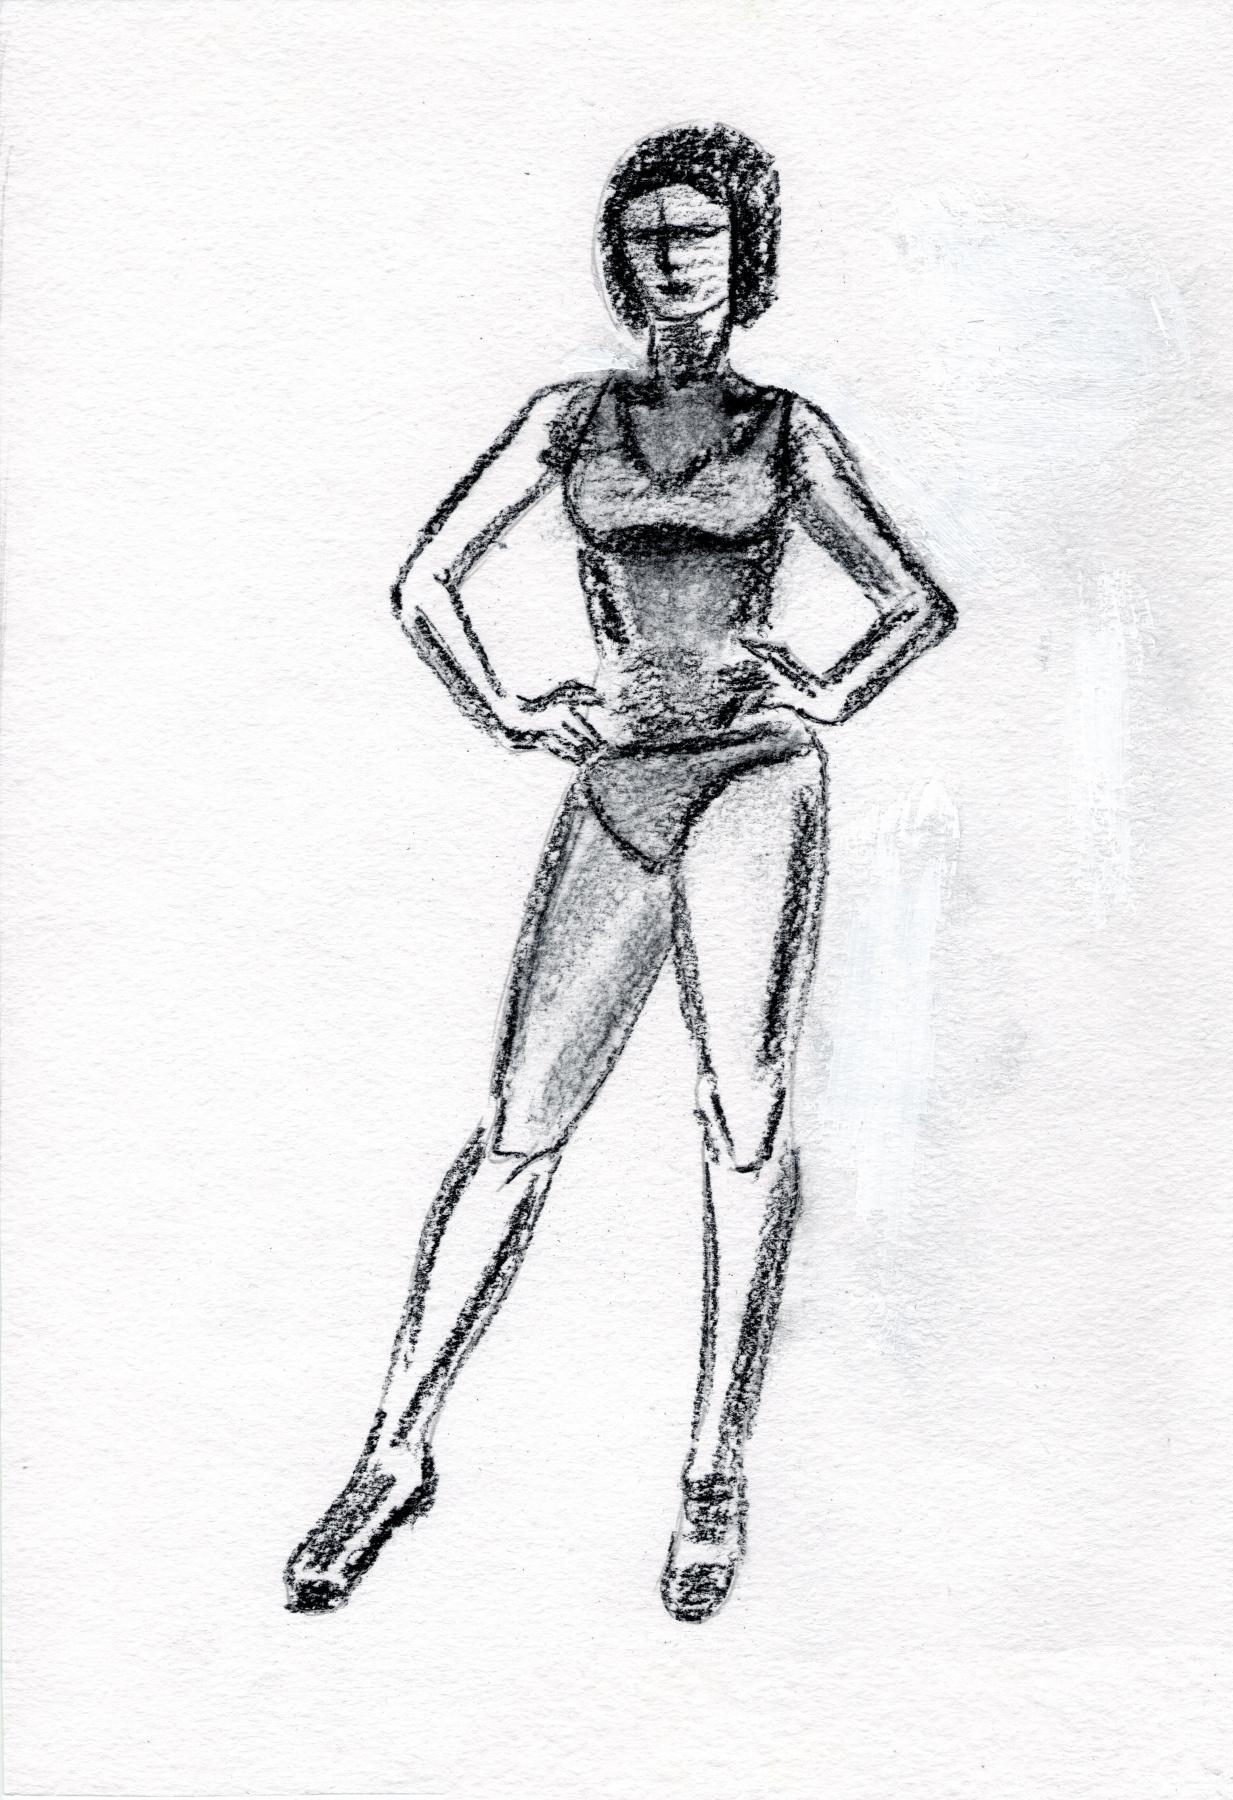 Polina. Woman. Sketch